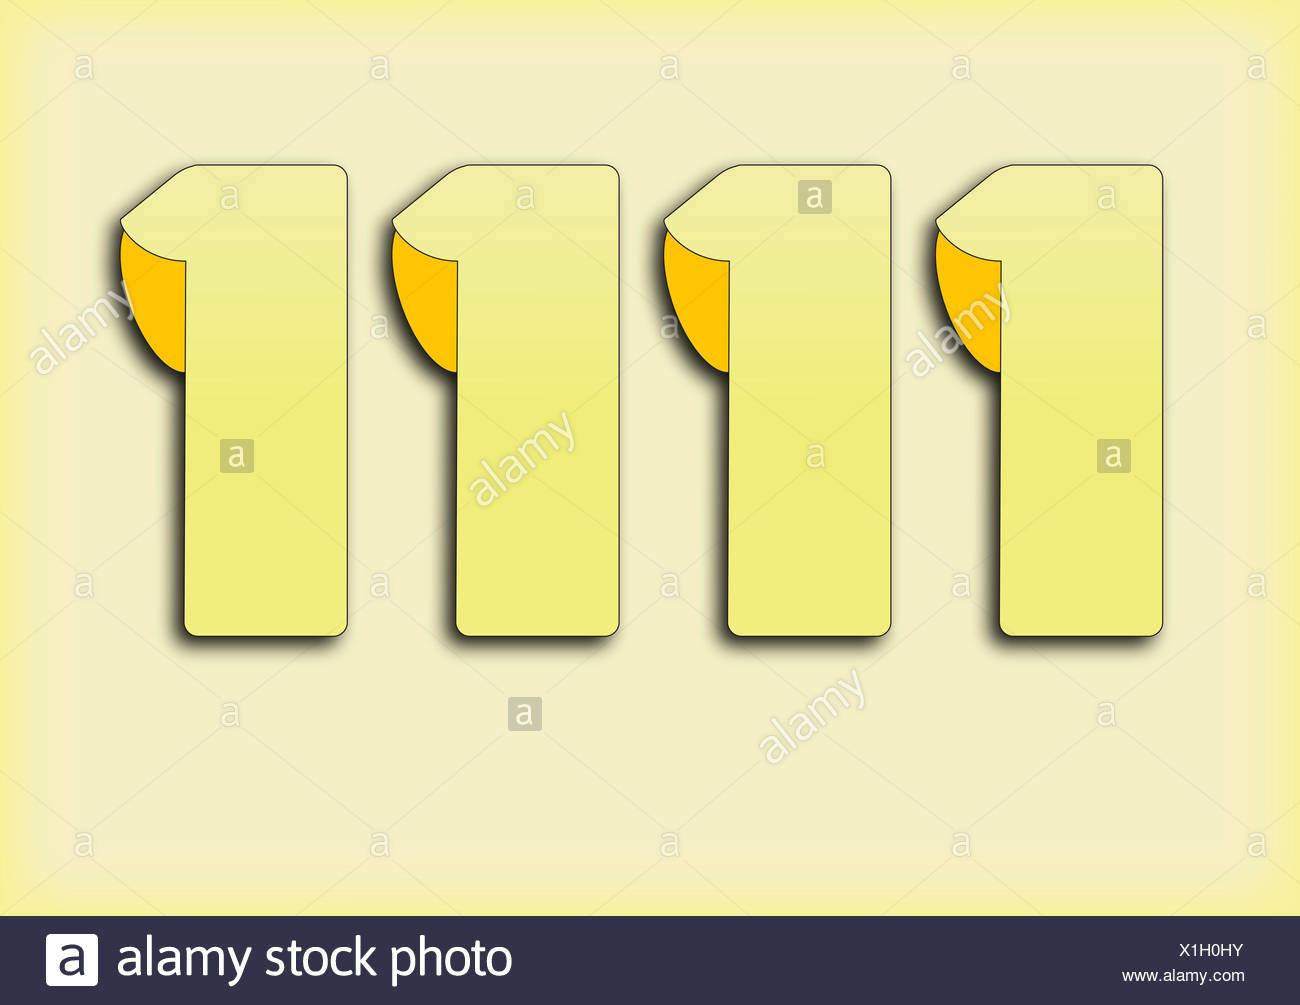 rectangle shaddow - Stock Image